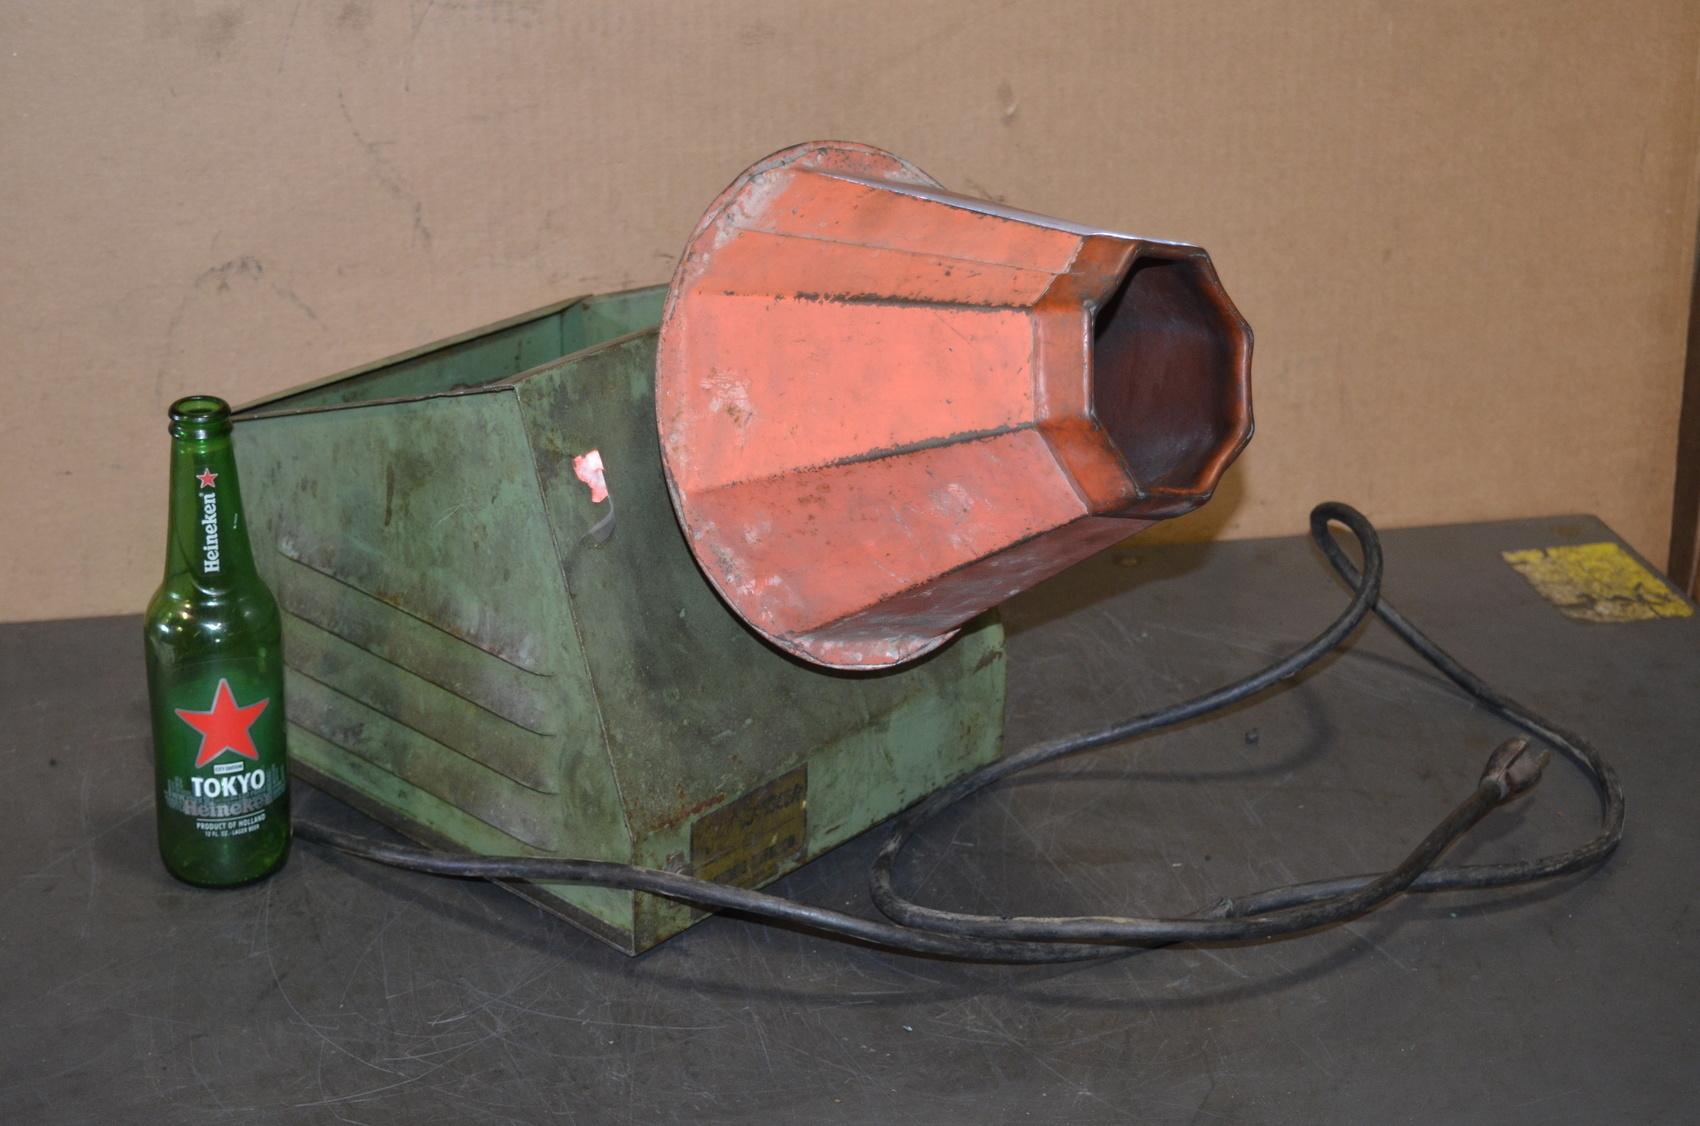 Rampe Vibratory Deburring and Finishing Machine Rock tumbler